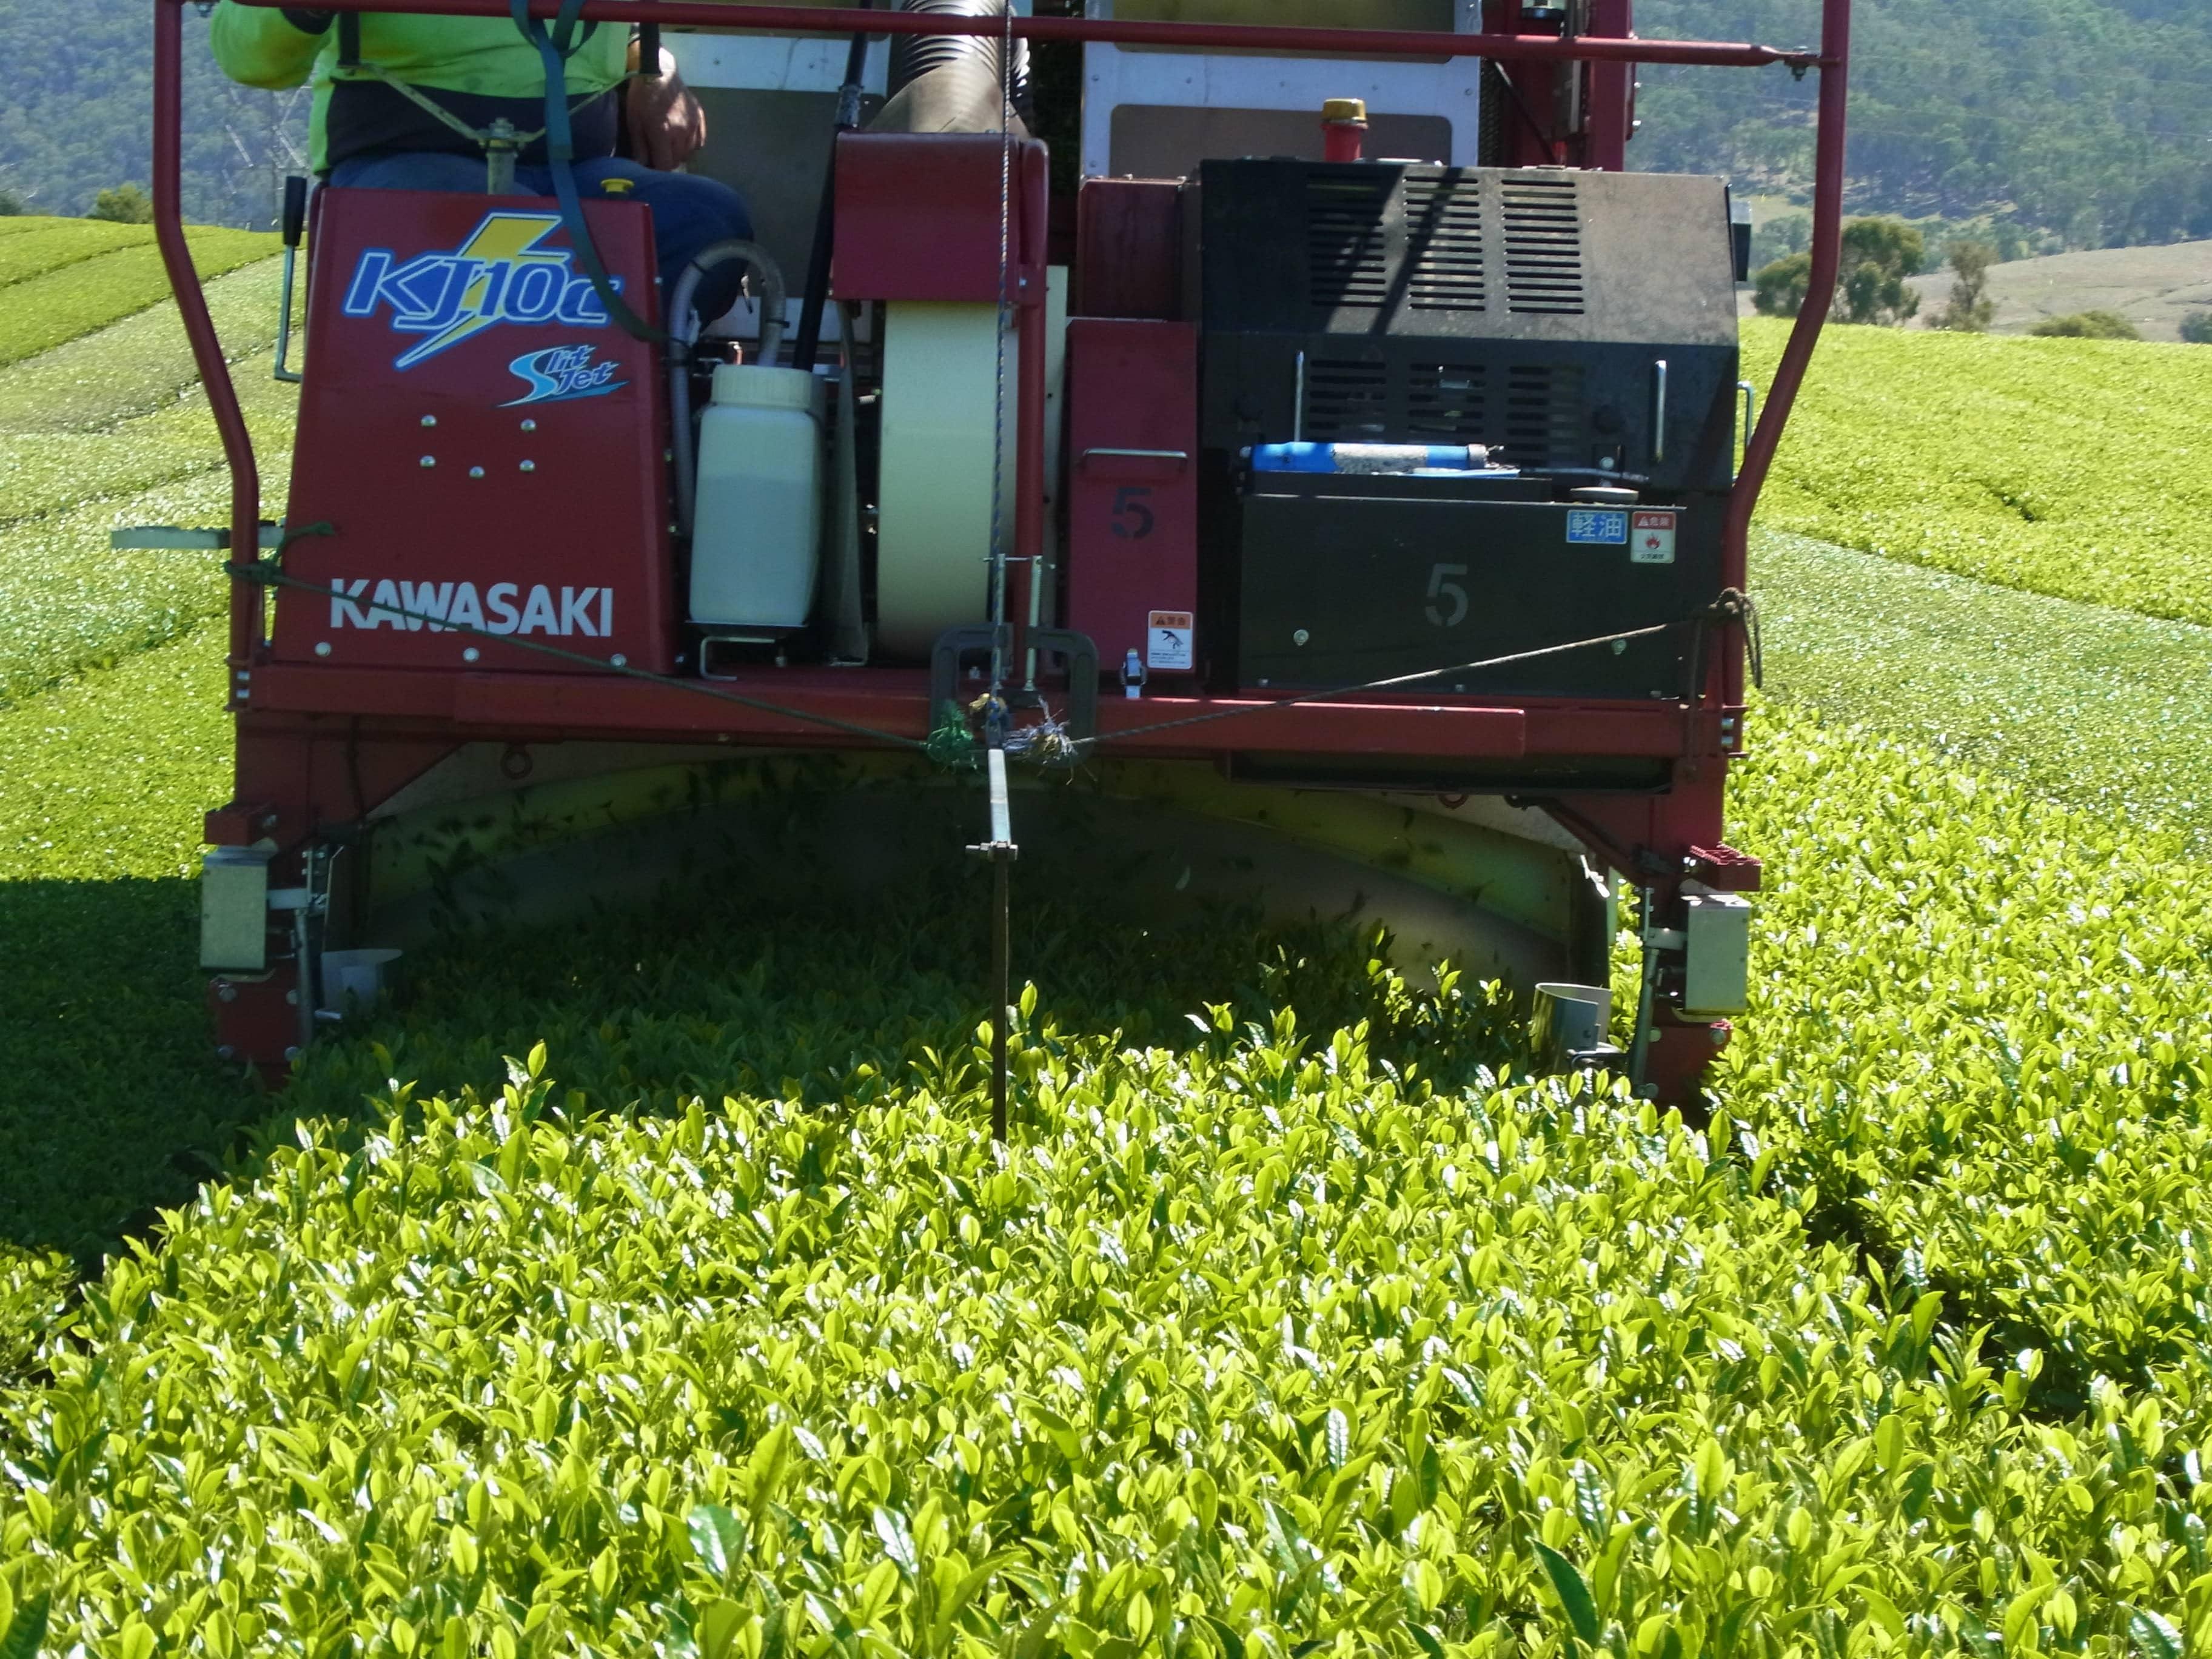 tea harvester in action